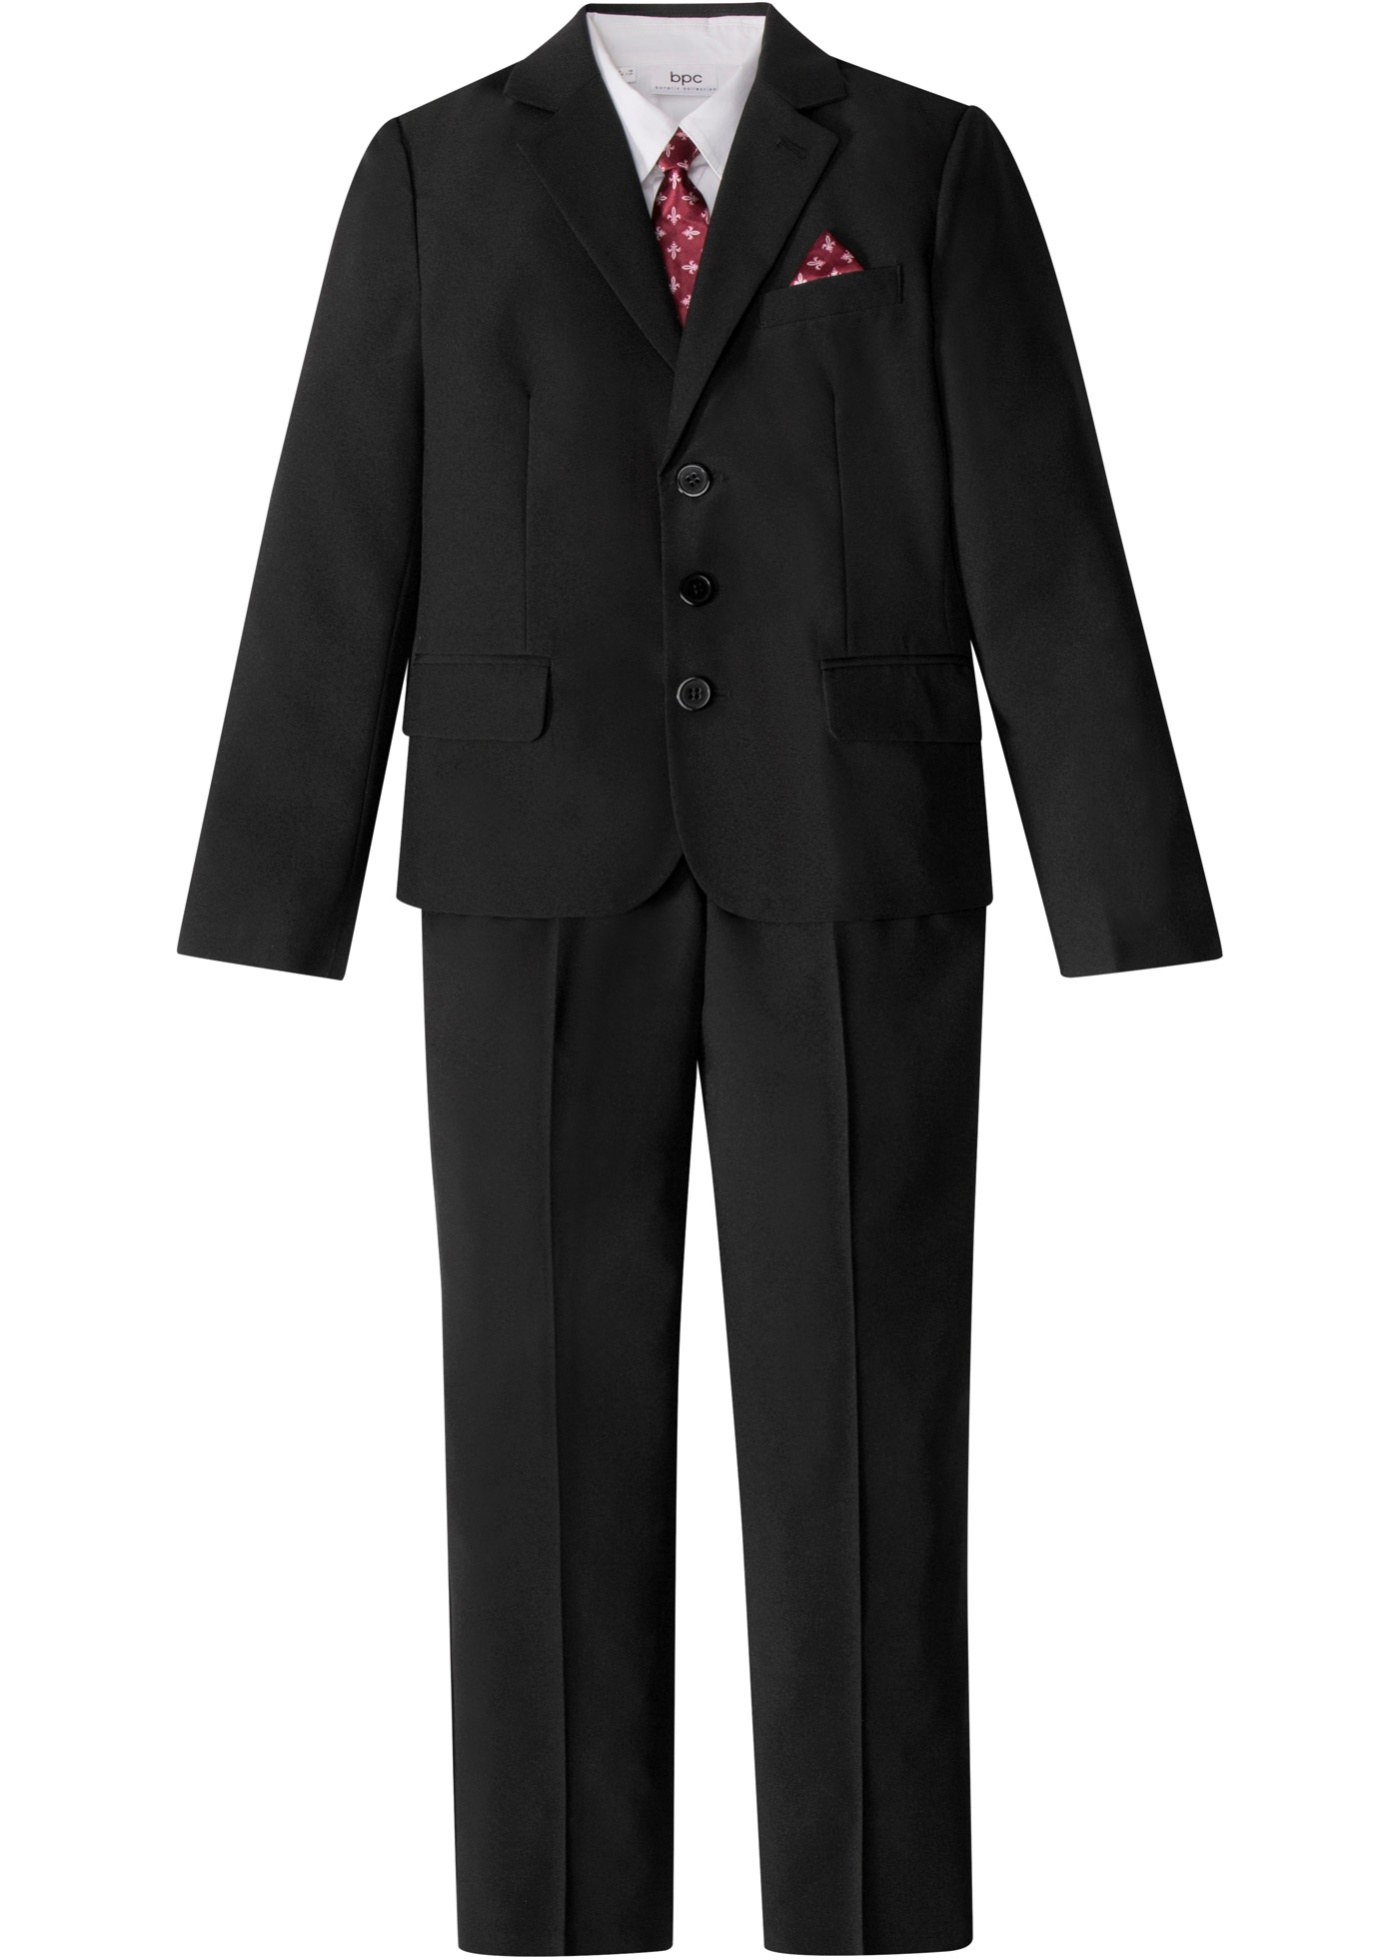 Image of Jungen Anzug + Hemd + Krawatte (4-tlg. Set)